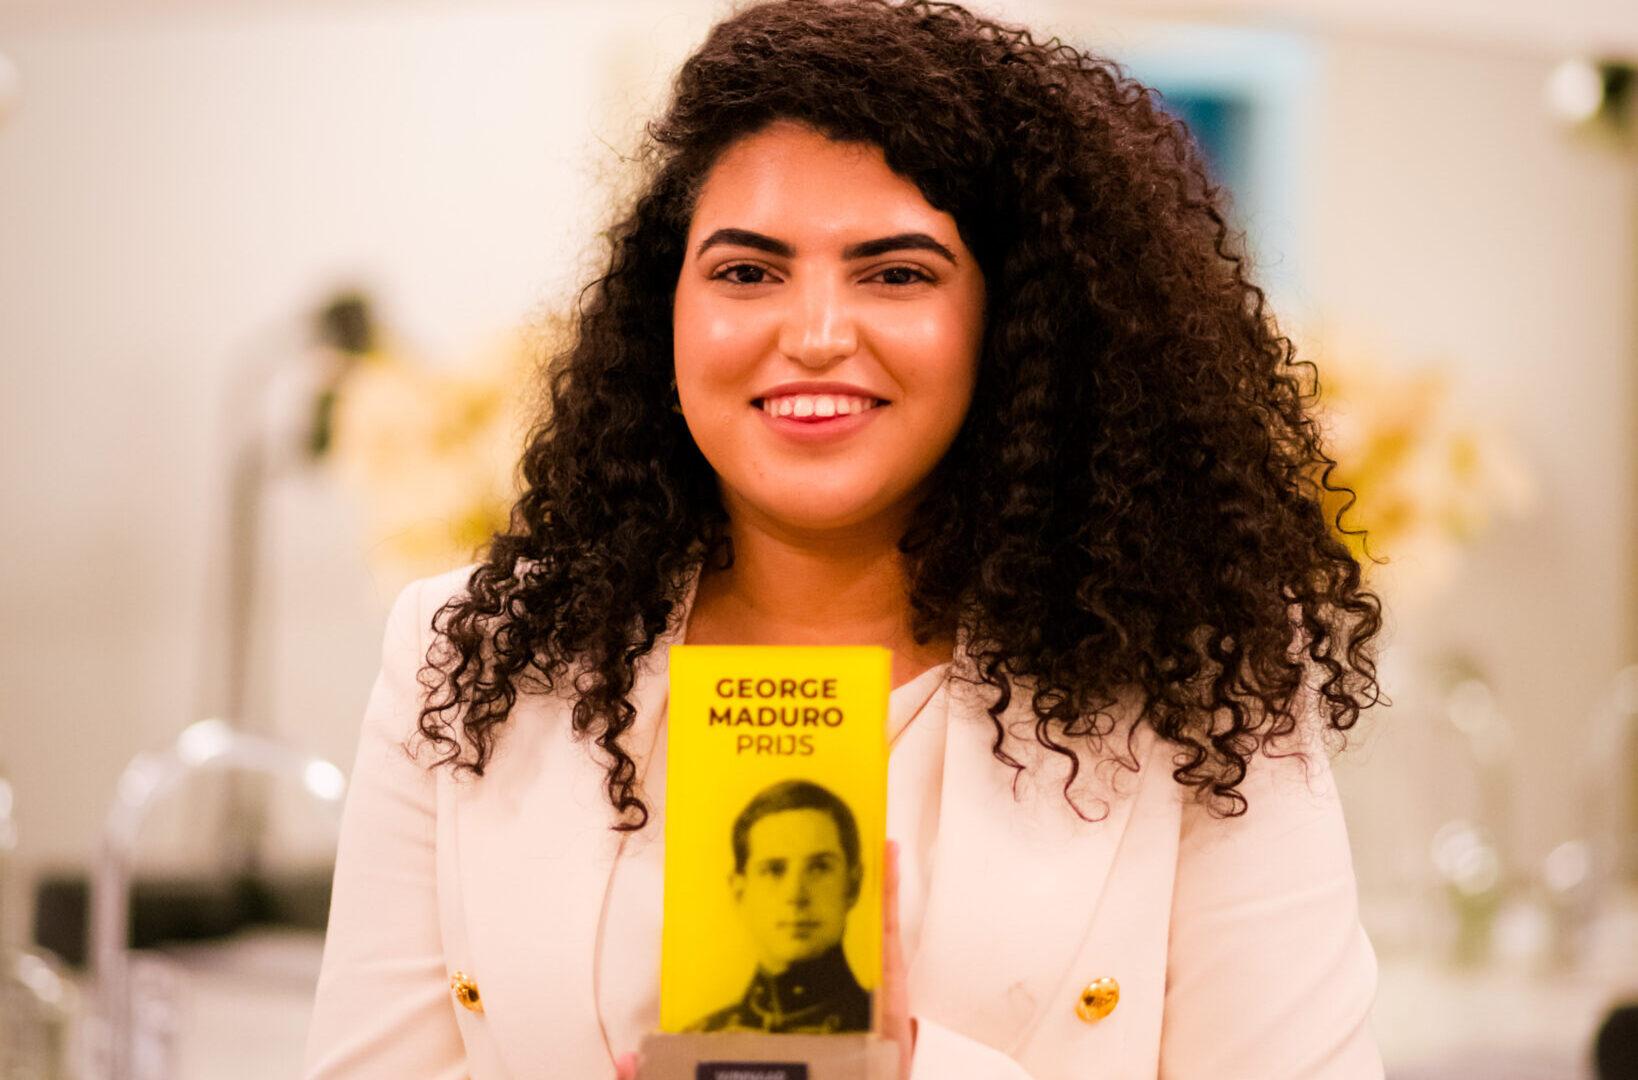 Young Impact Awards: Aya Laghzaoui (19) wint George Maduro Prijs 2020